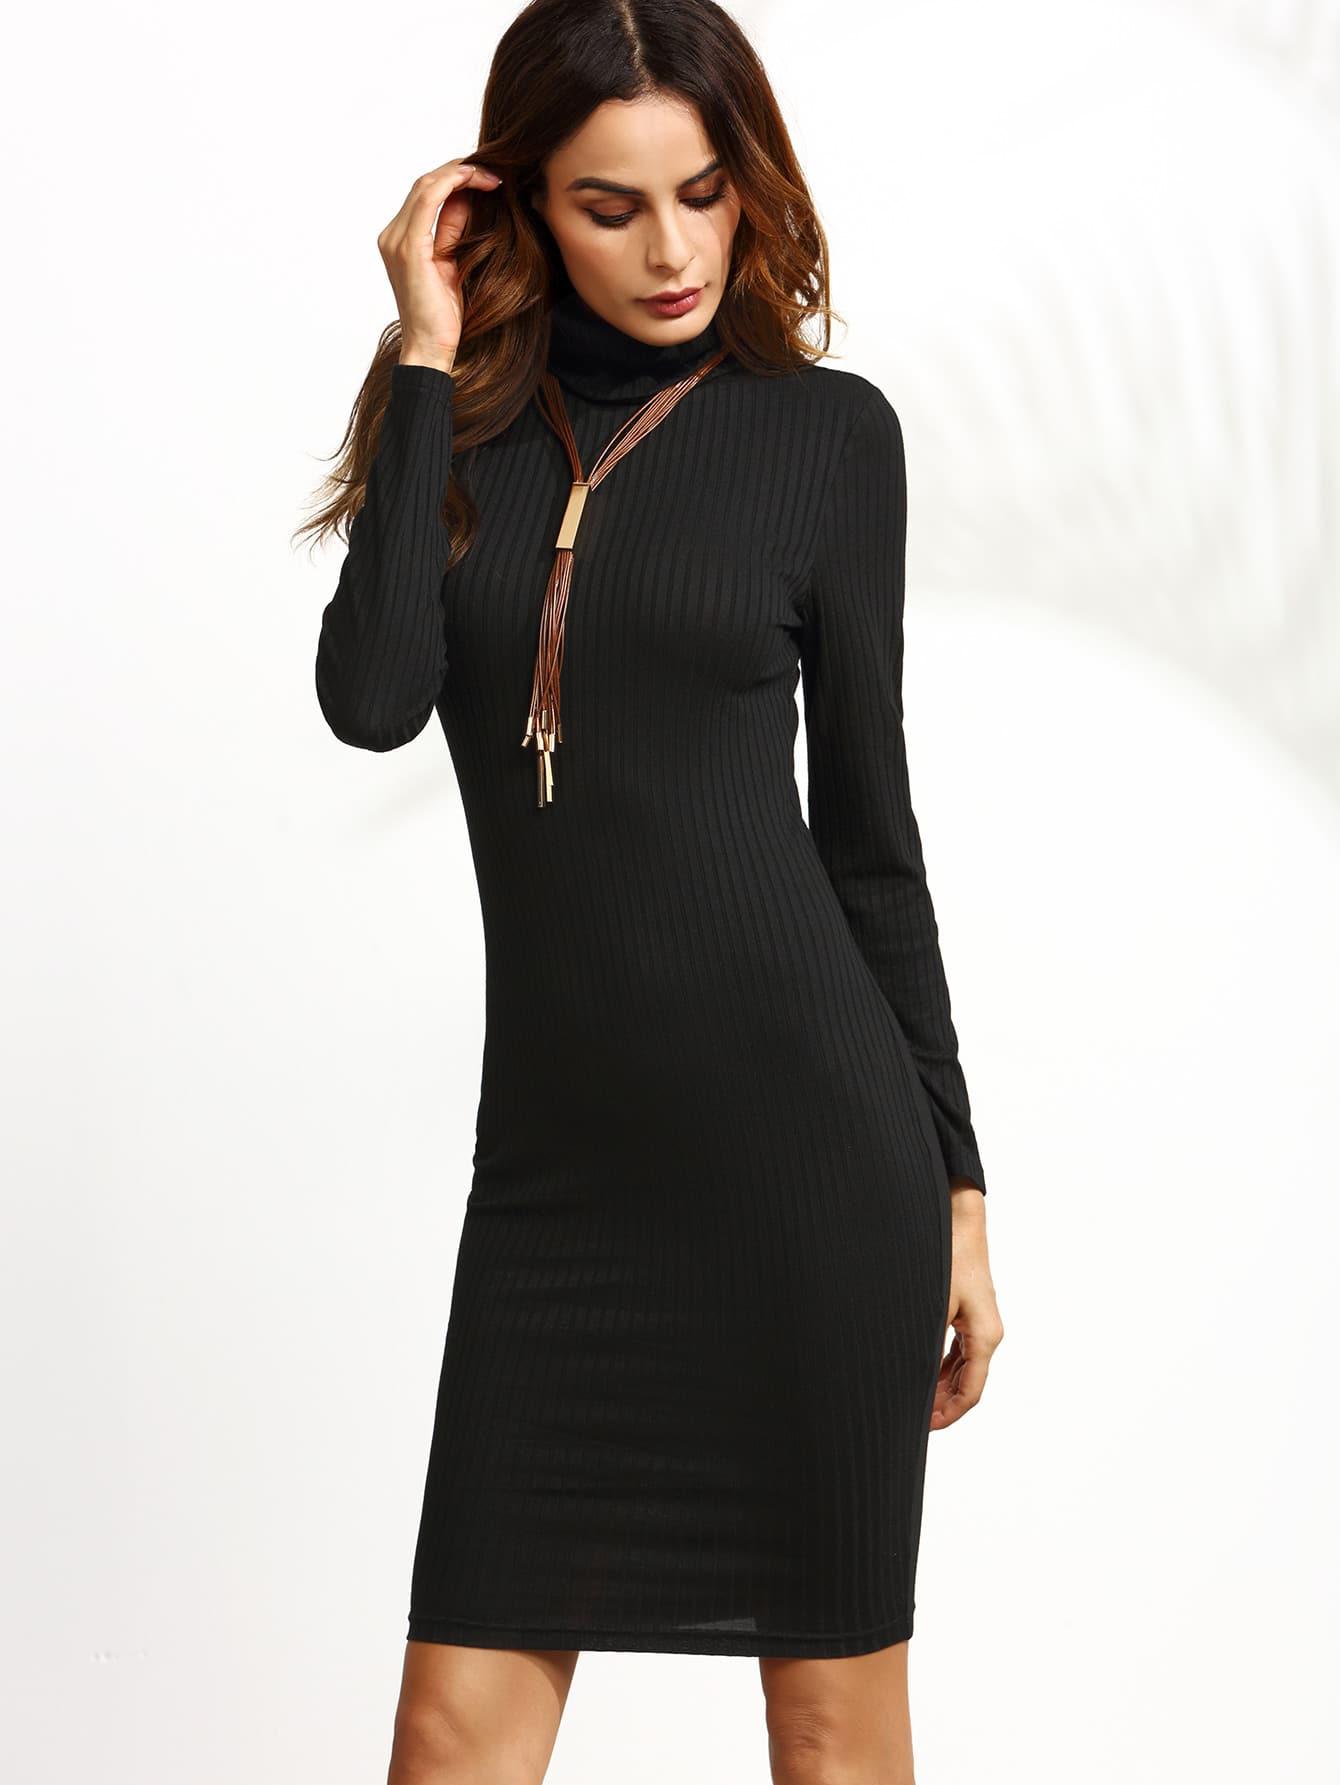 Turtleneck Ribbed Pencil Dress dress160818701